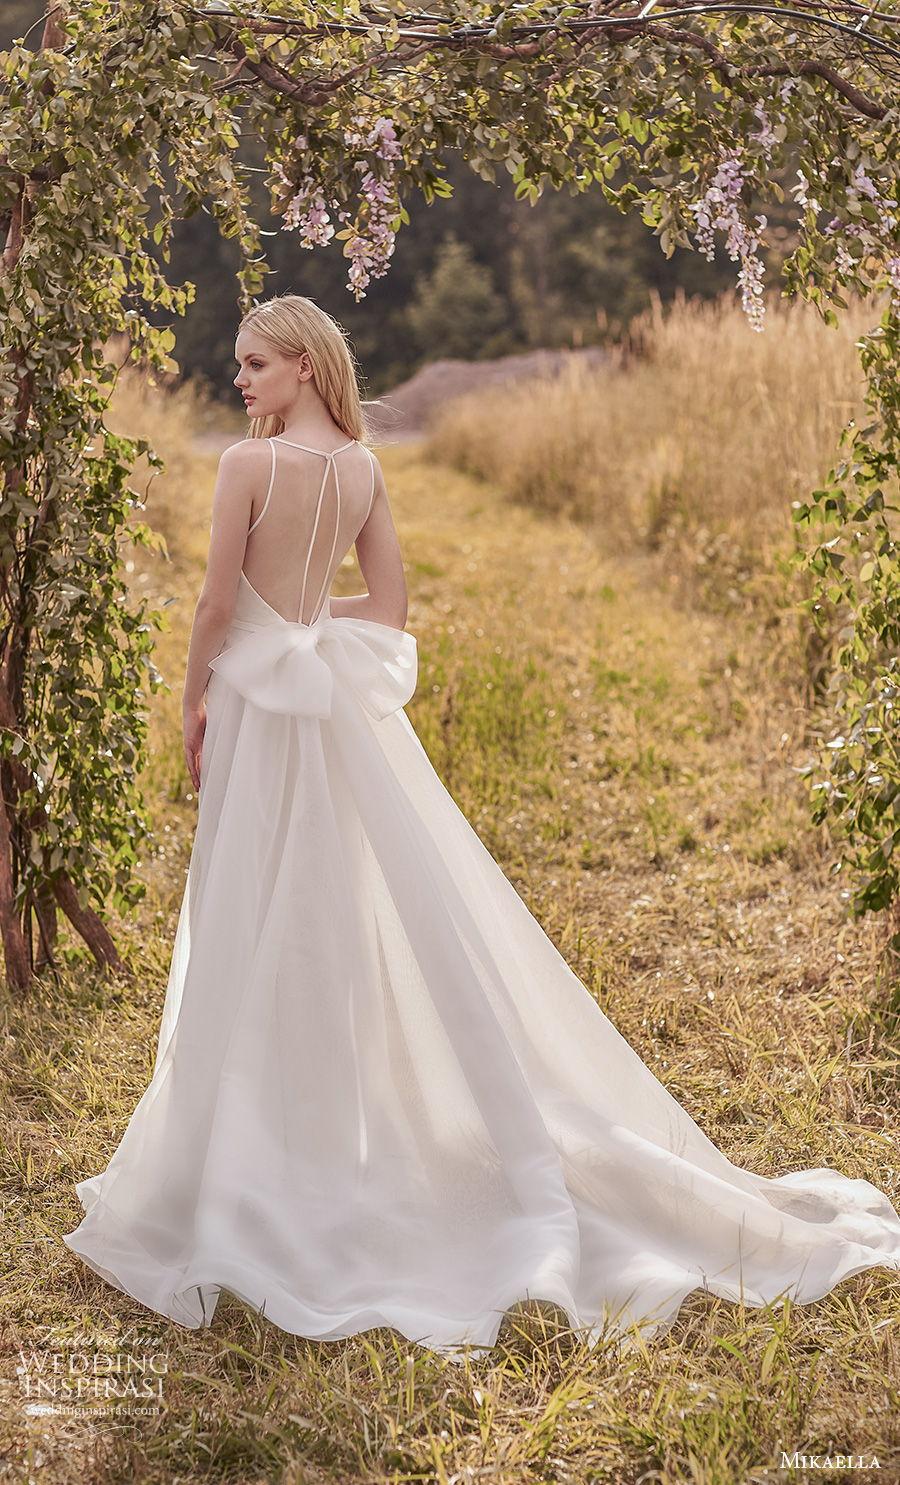 mikaella spring 2020 bridal sleeveless illusion bateau sweetheart neckline simple minimalist elegant fit and flare wedding dress a  line overskirt sheer keyhole back chapel train (1) bv